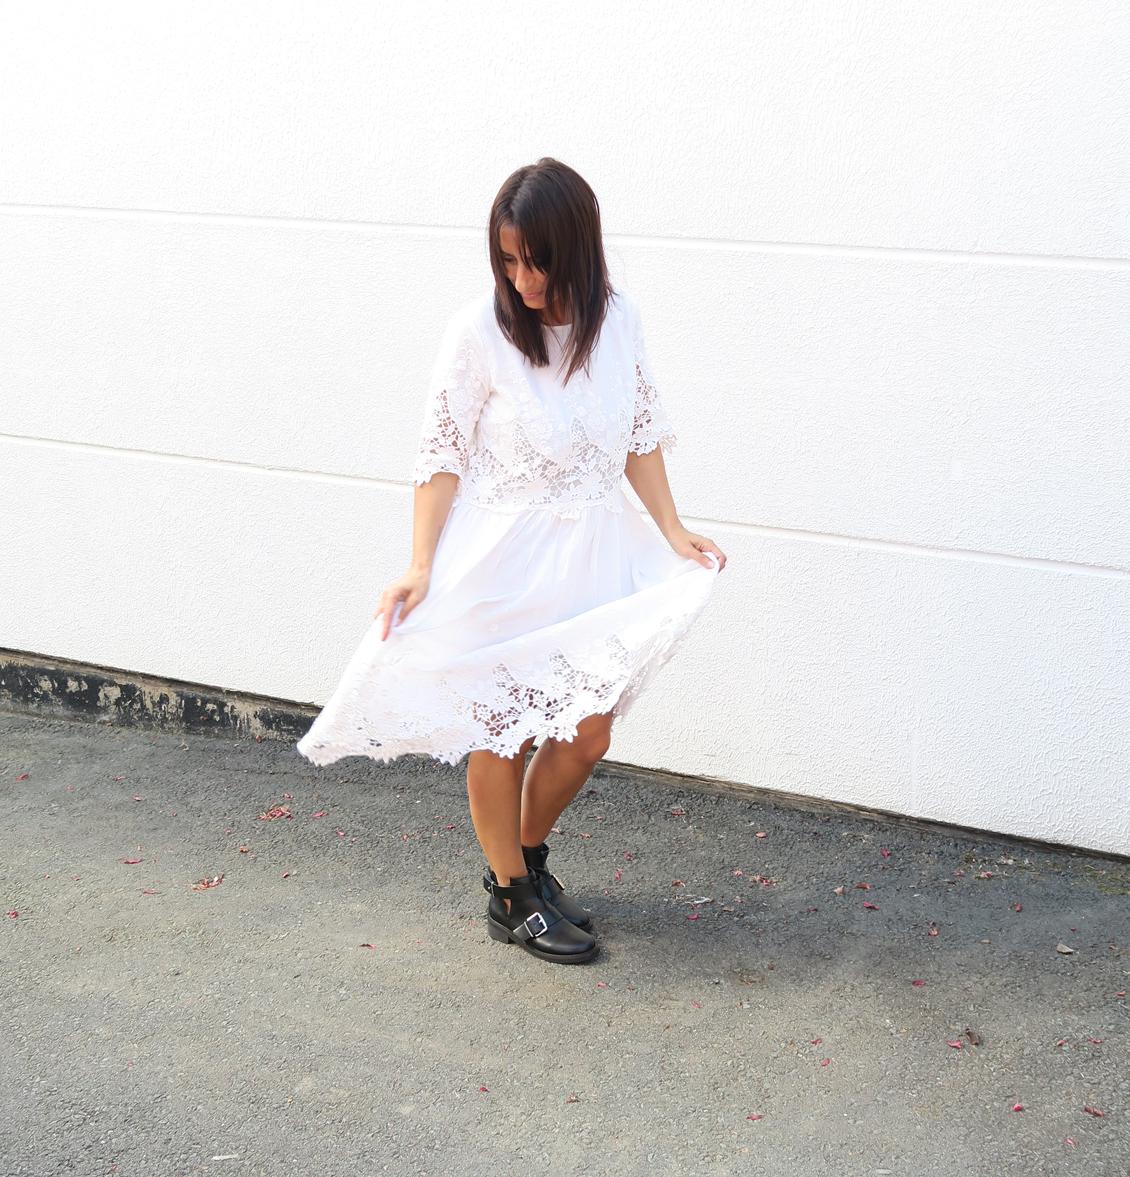 blogger-edited-style-look-bloggerstyle-spitzenkleid-dress-kleid-boots-bikerboots-4